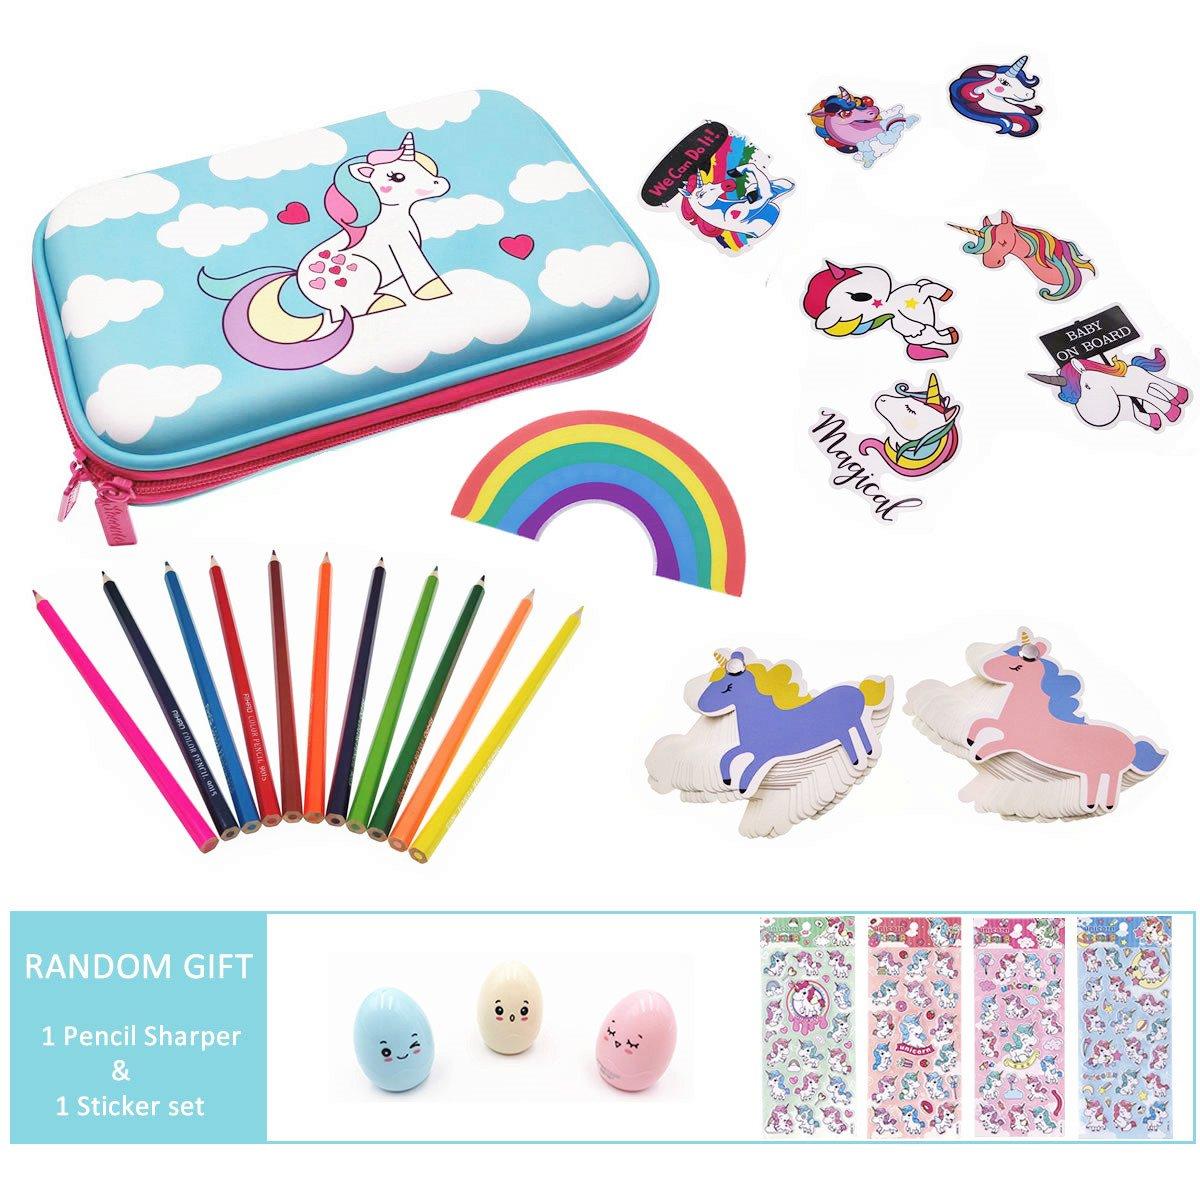 Cute Unicorn School Supplies for Girls, Unicorn Stationery Pencil Case, Pencils, Stickers and Rainbow Eraser KASU